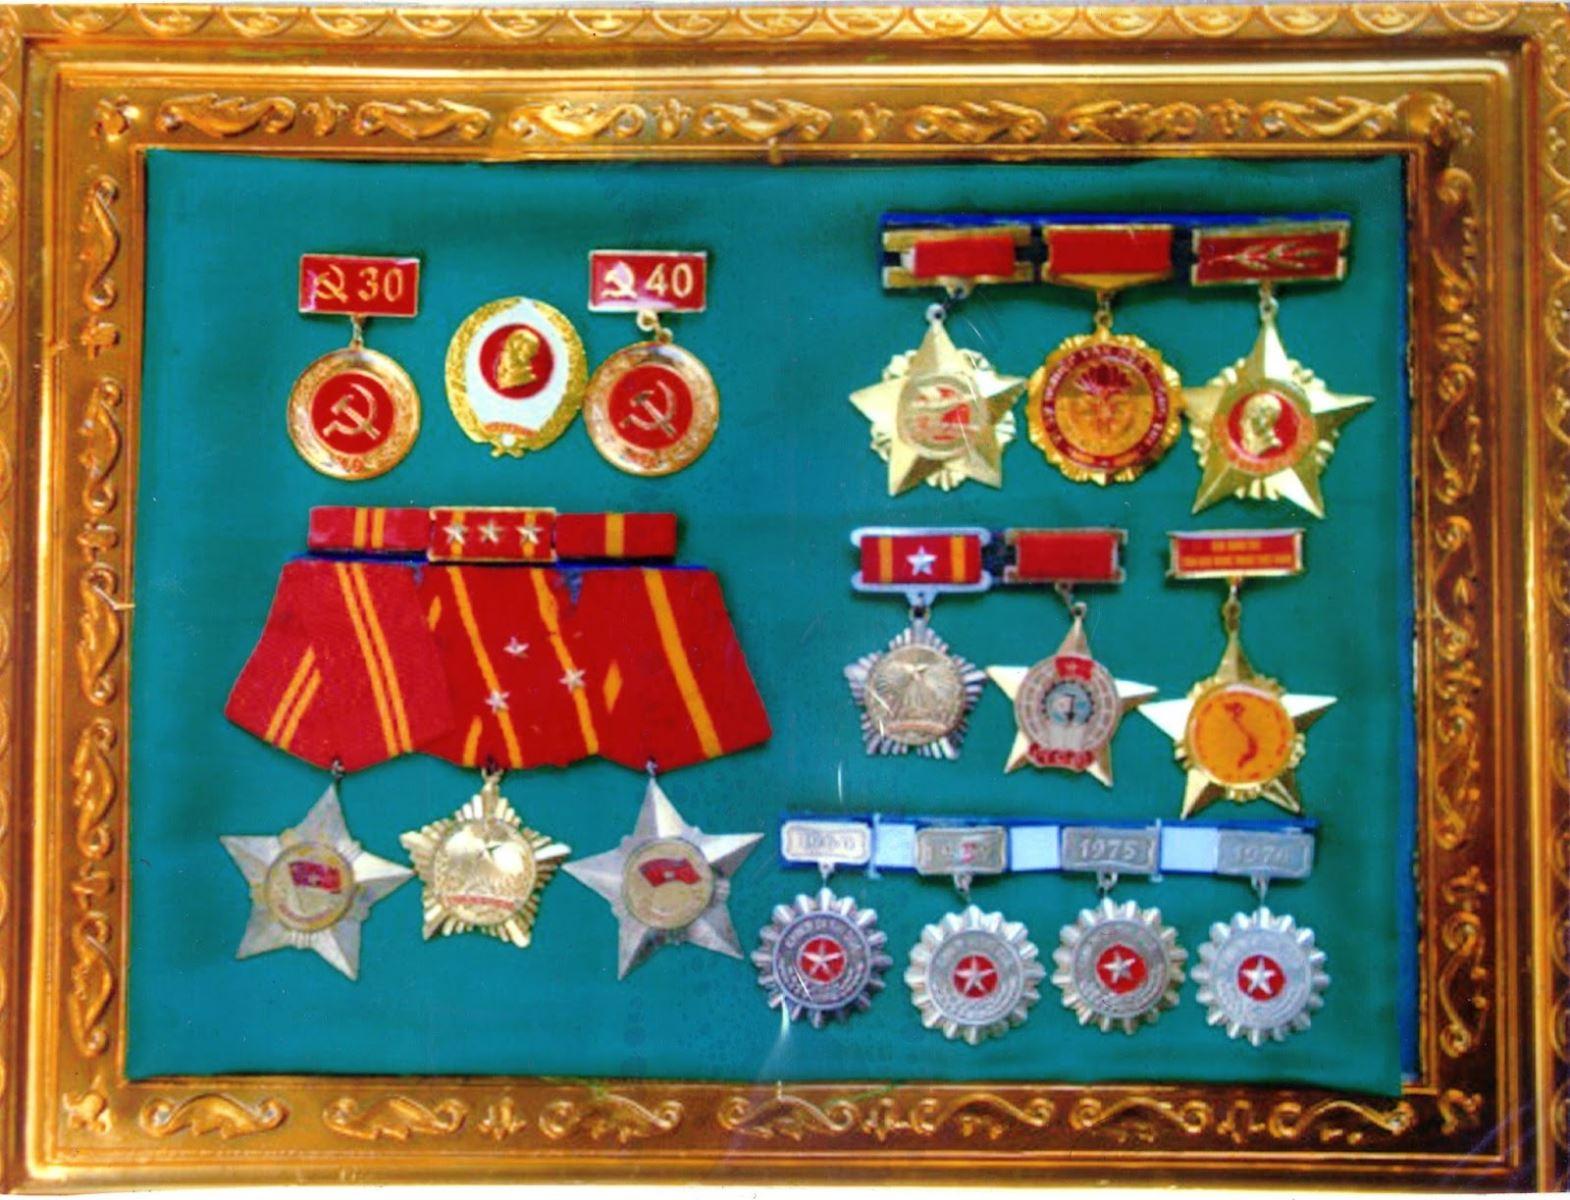 Mẫu huy chương